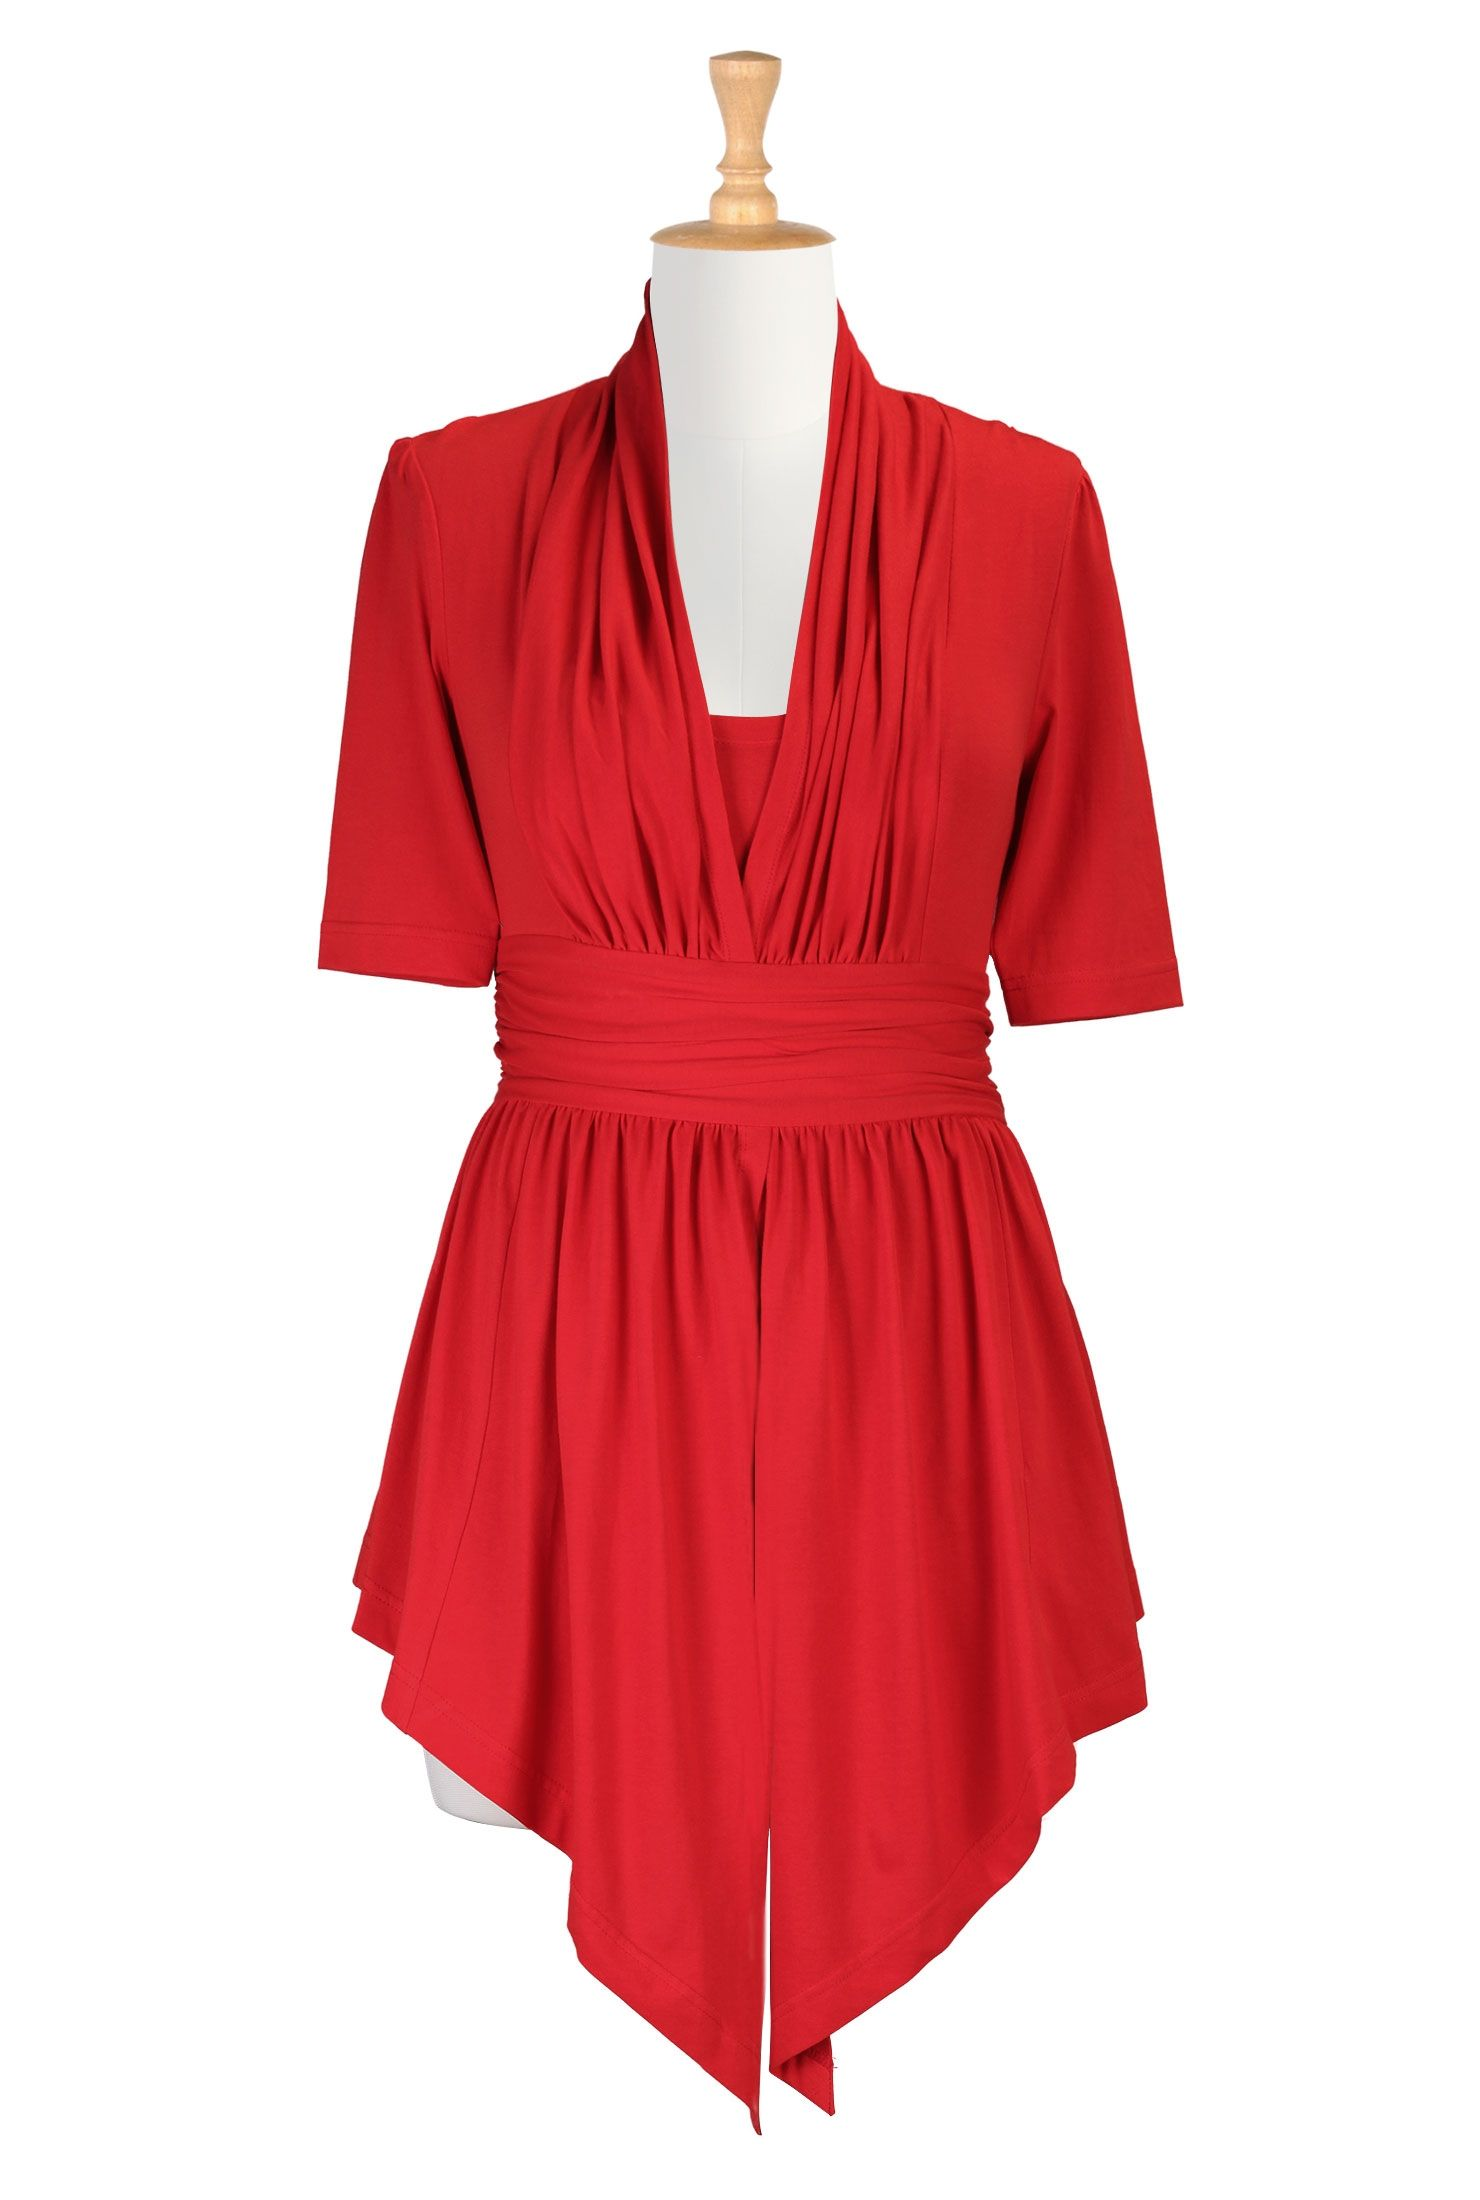 96d2c1e11c1af Women s designer clothing - Shop Women s Long Sleeve Tops - Tunic Tops